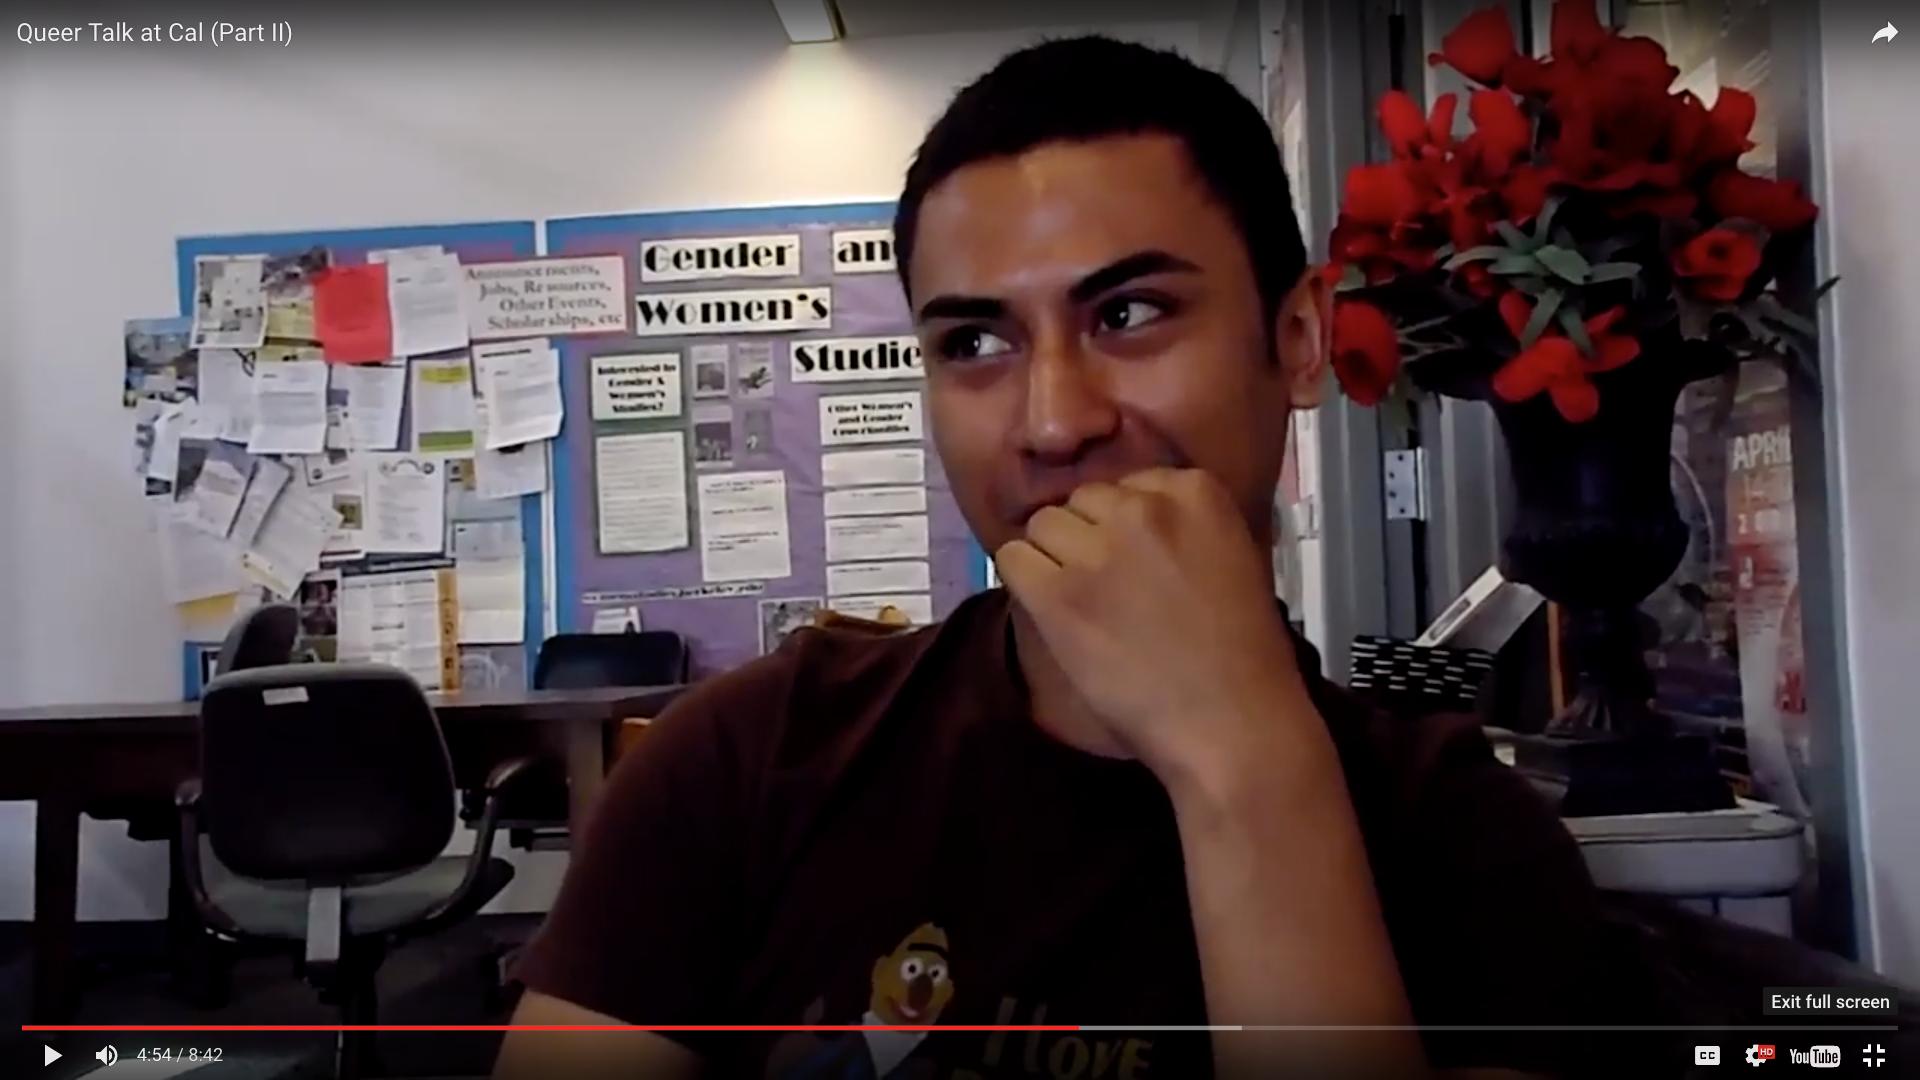 Queer Talk at Cal Part II Video Screenshot